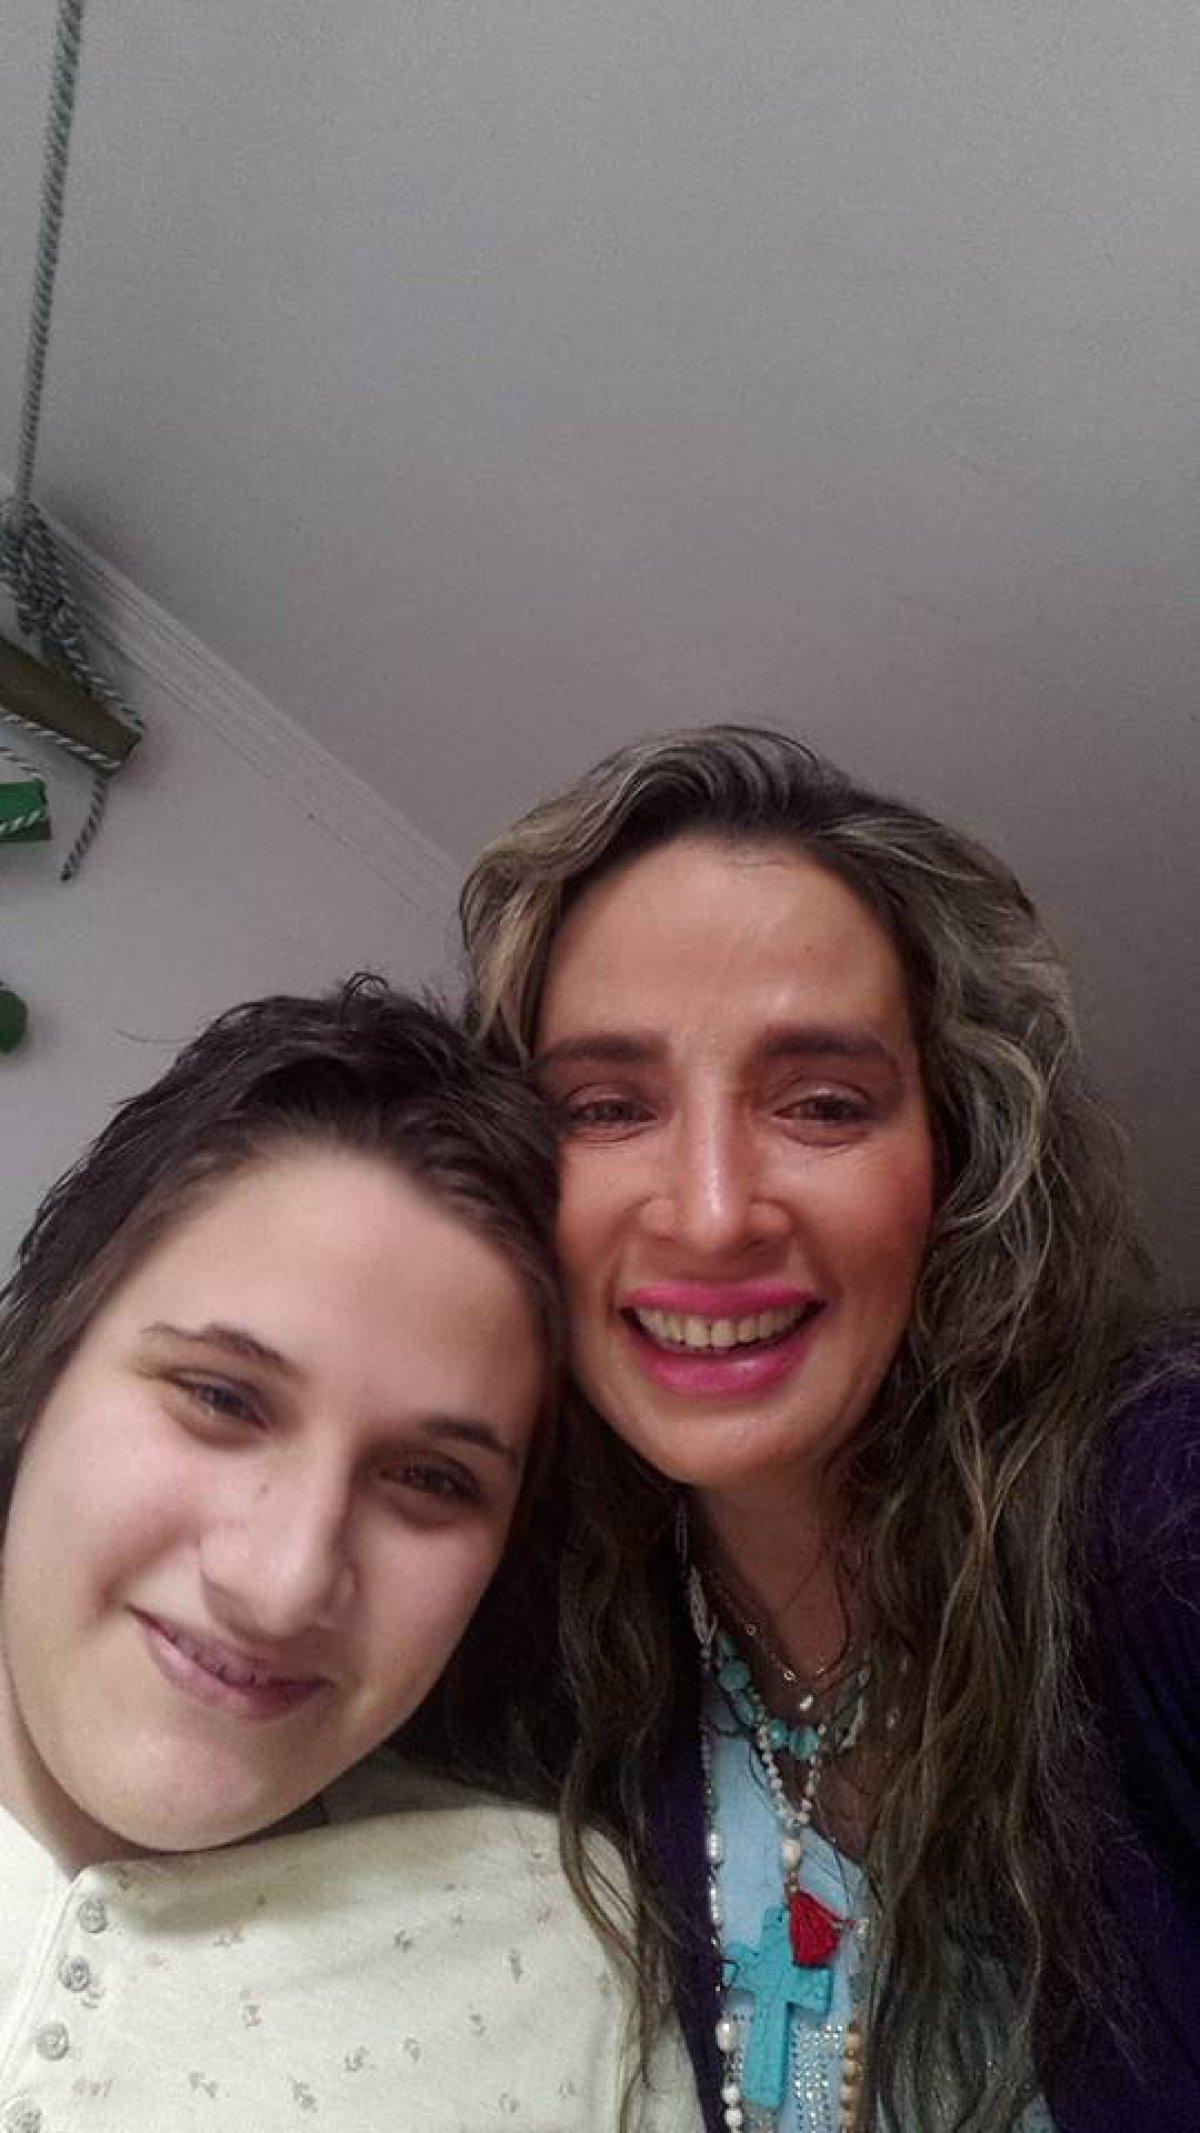 Selfie Luly Bossa nude photos 2019